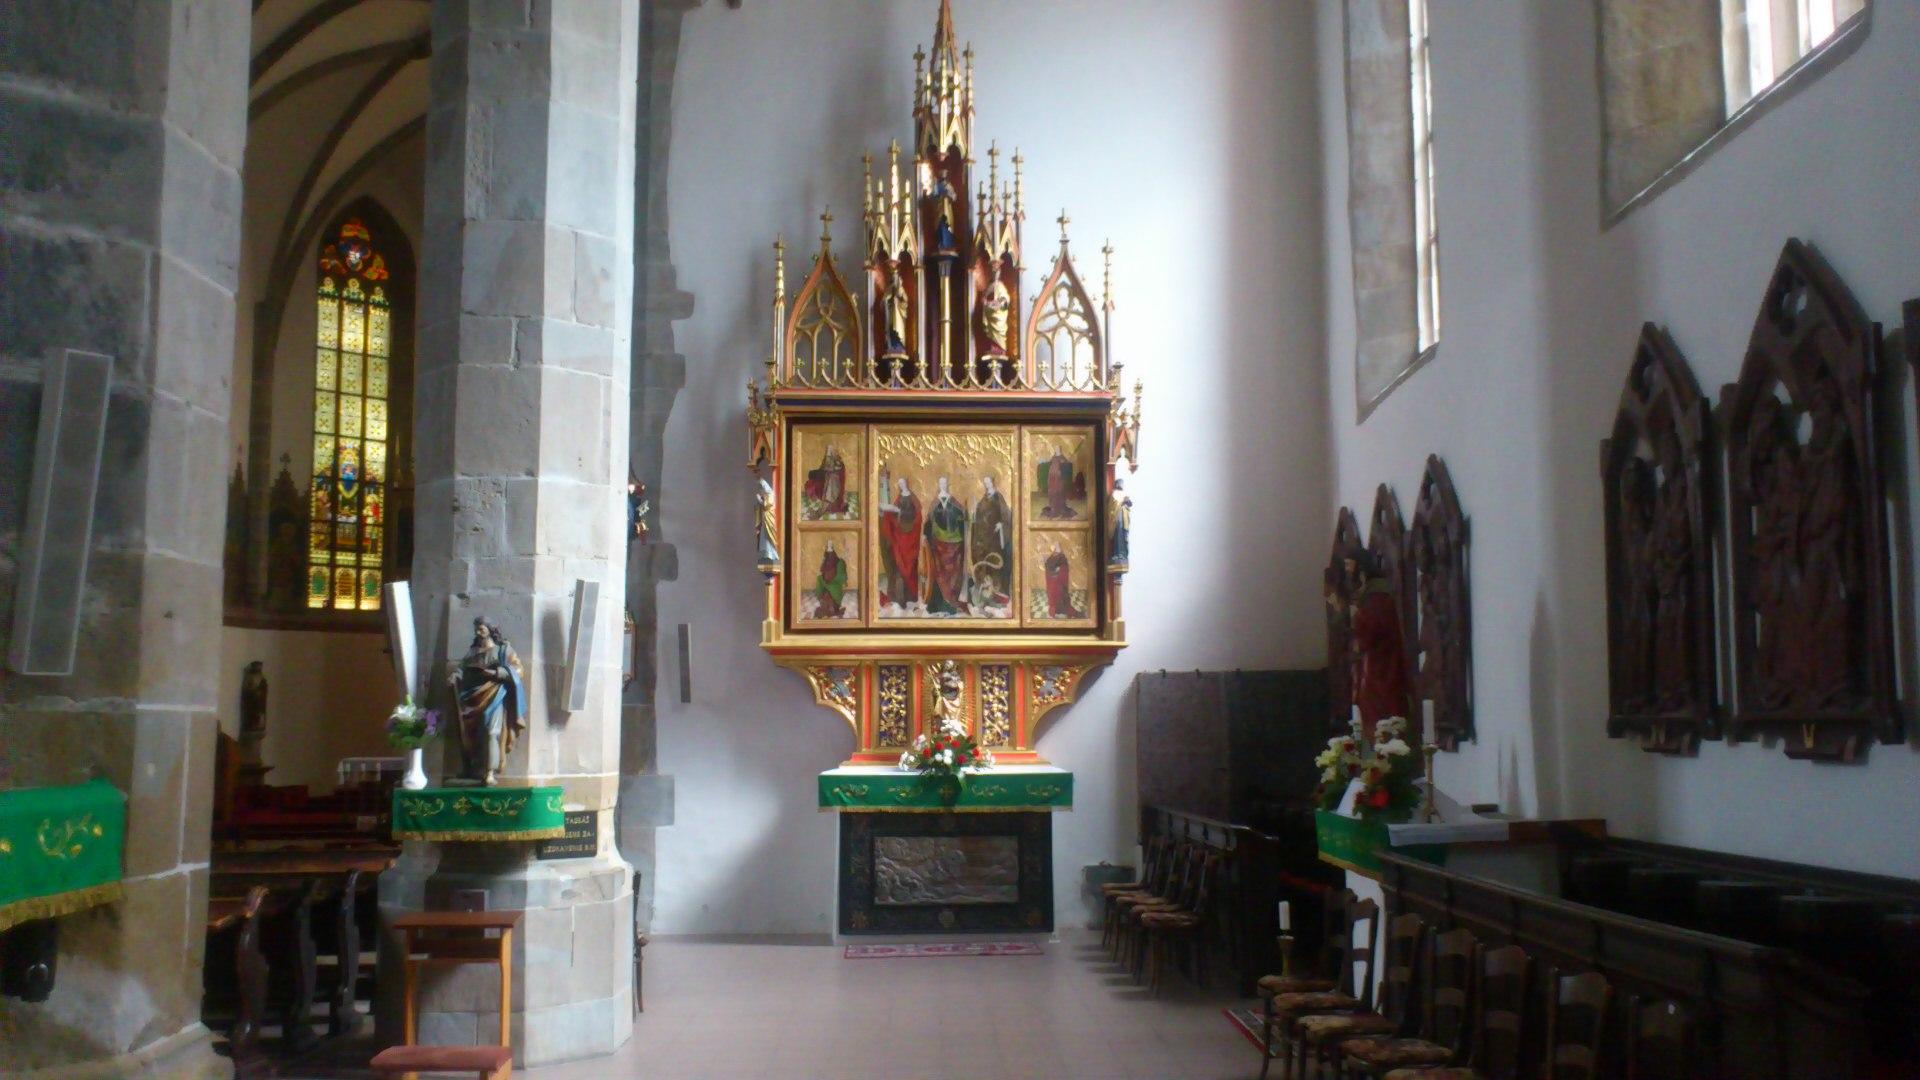 bazilika minor sv. kriza kezmarok renesancna zvonica spis slovensko